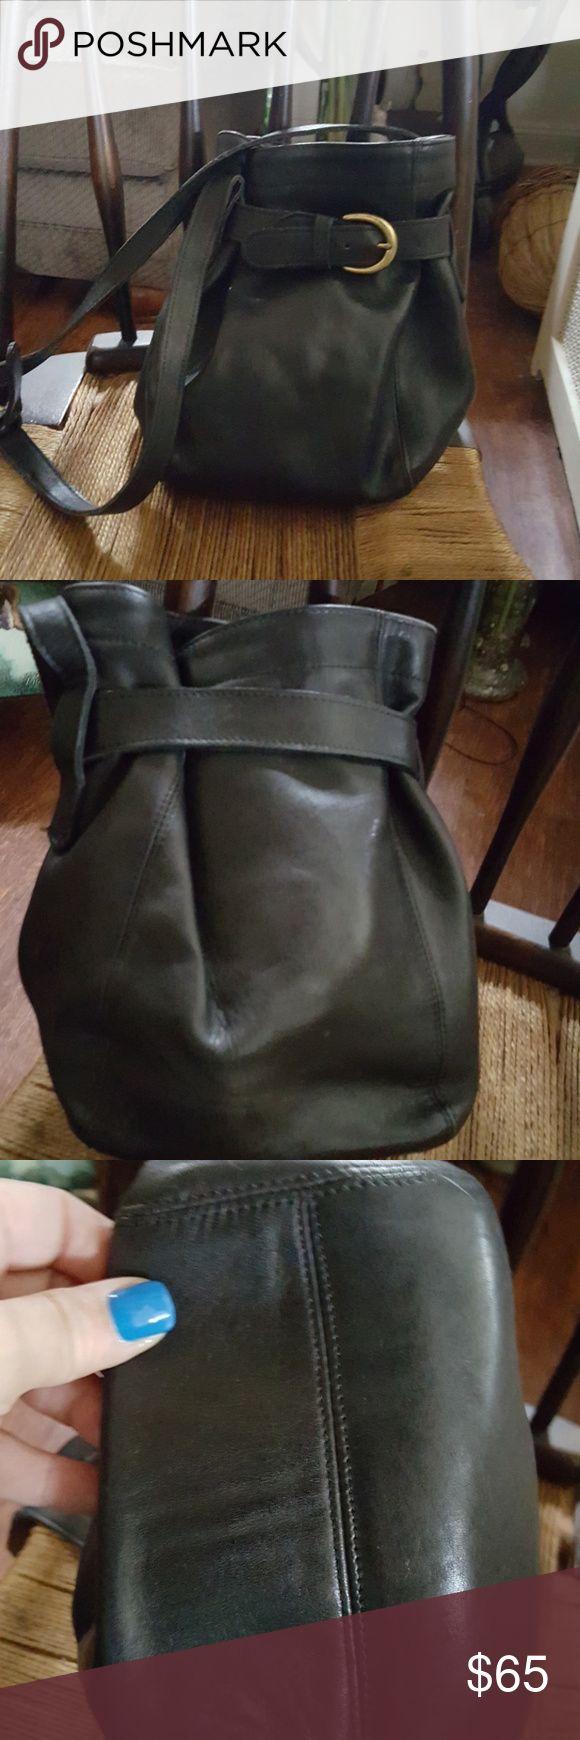 Fab vintage coach bag